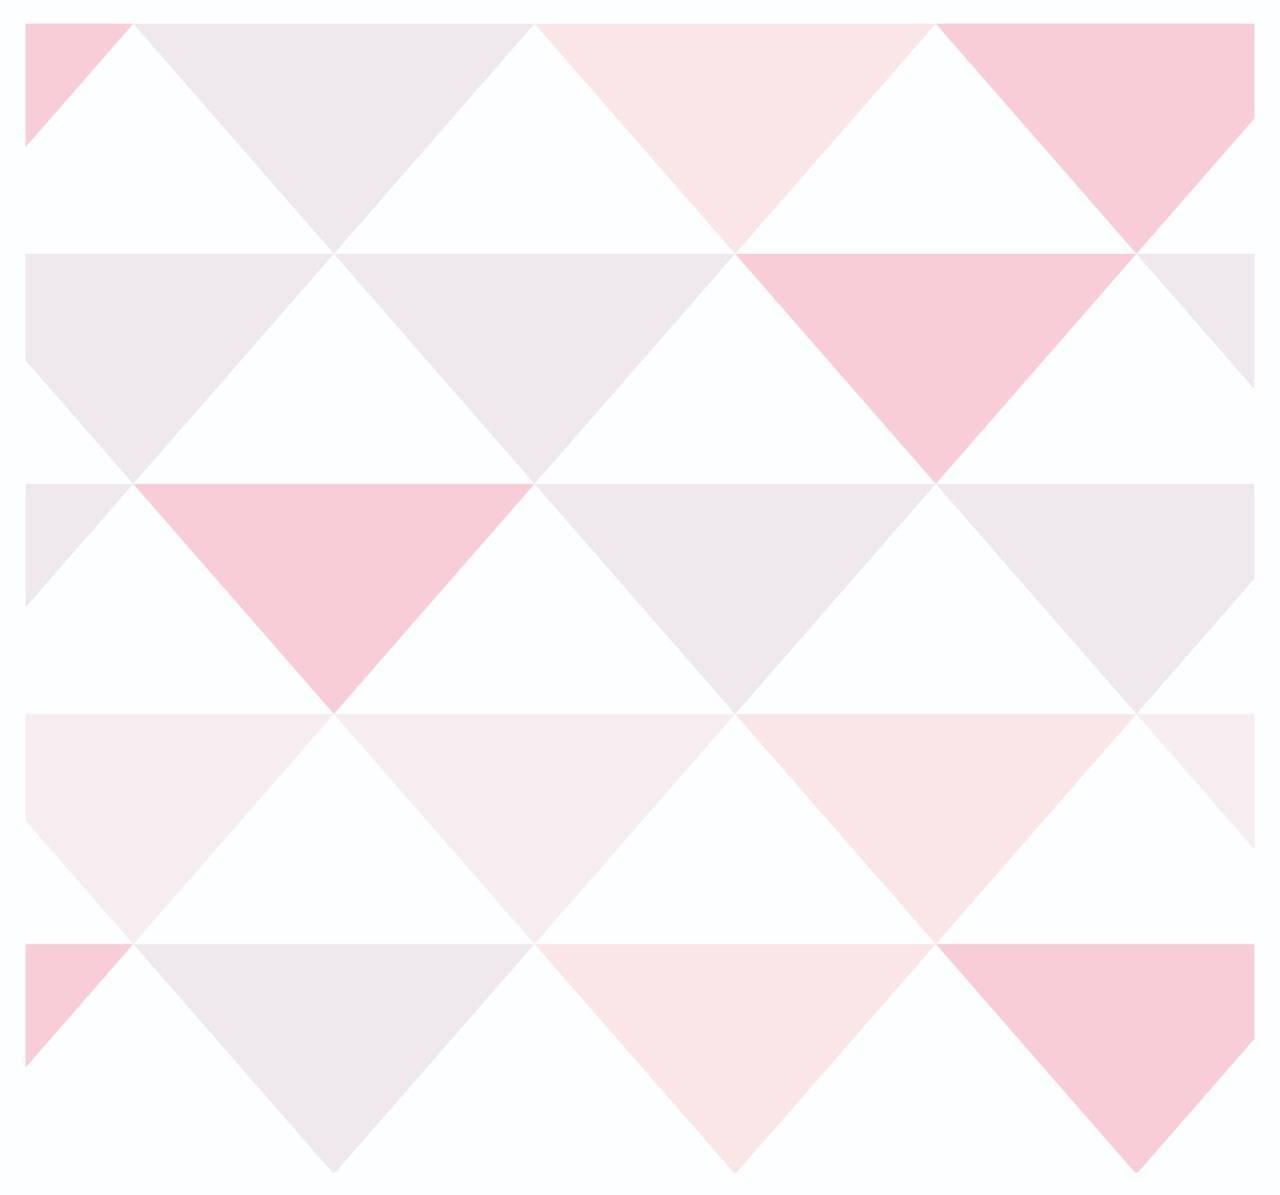 Papel De Parede Adesivo Abstrato Triângulos Rosa 300x52cm - LCGELETRO